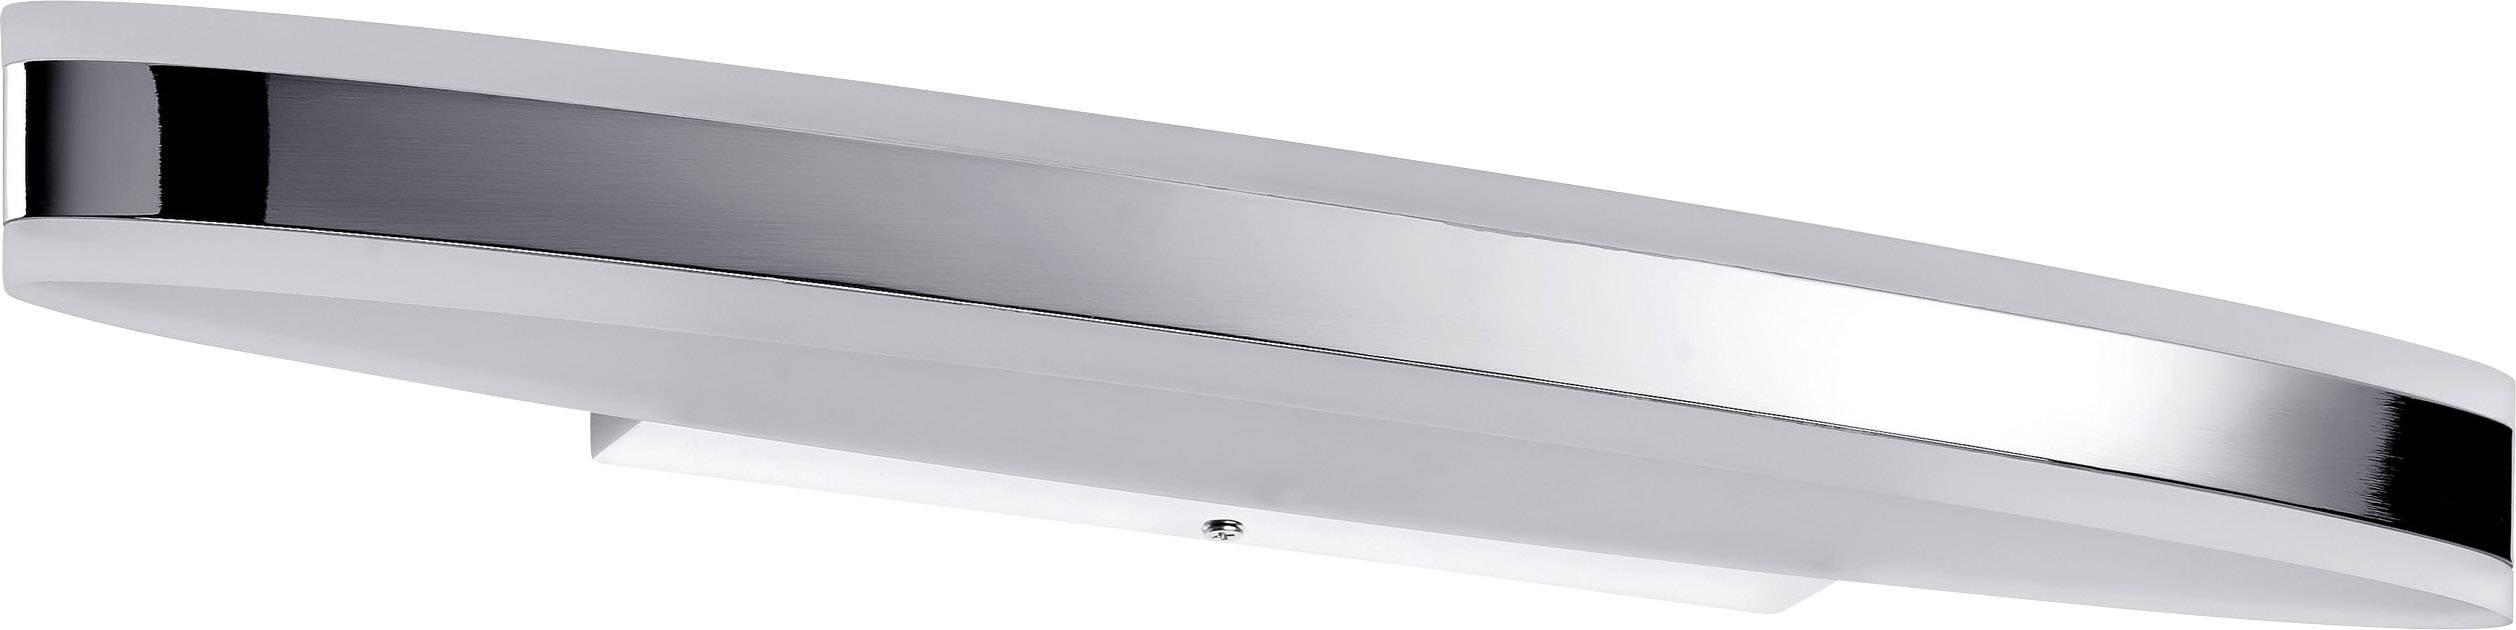 Badkamer Wandlamp Ikea : ▷ badkamer wandlamp ikea kopen online internetwinkel